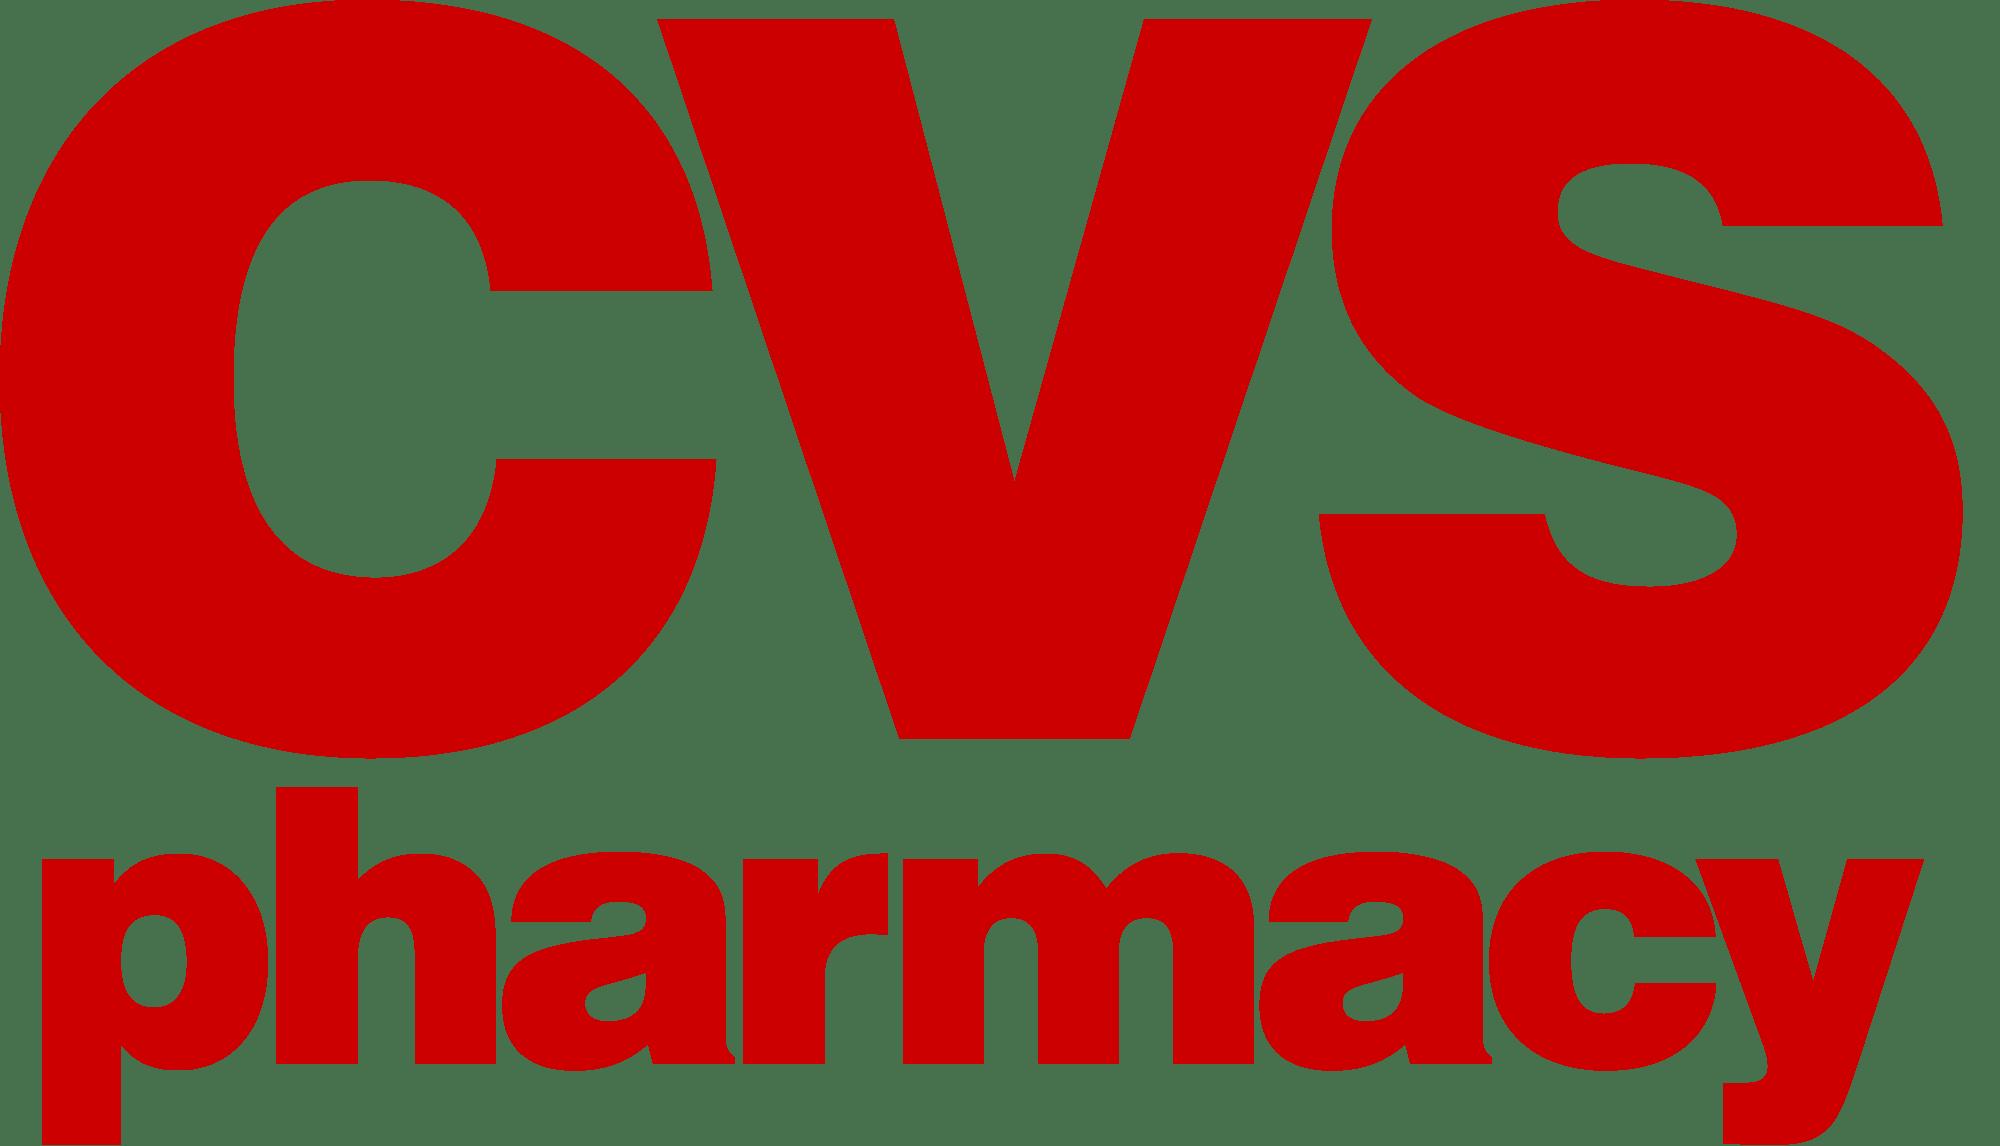 CVS Deal汇总 (10/23/16-10/29/16)